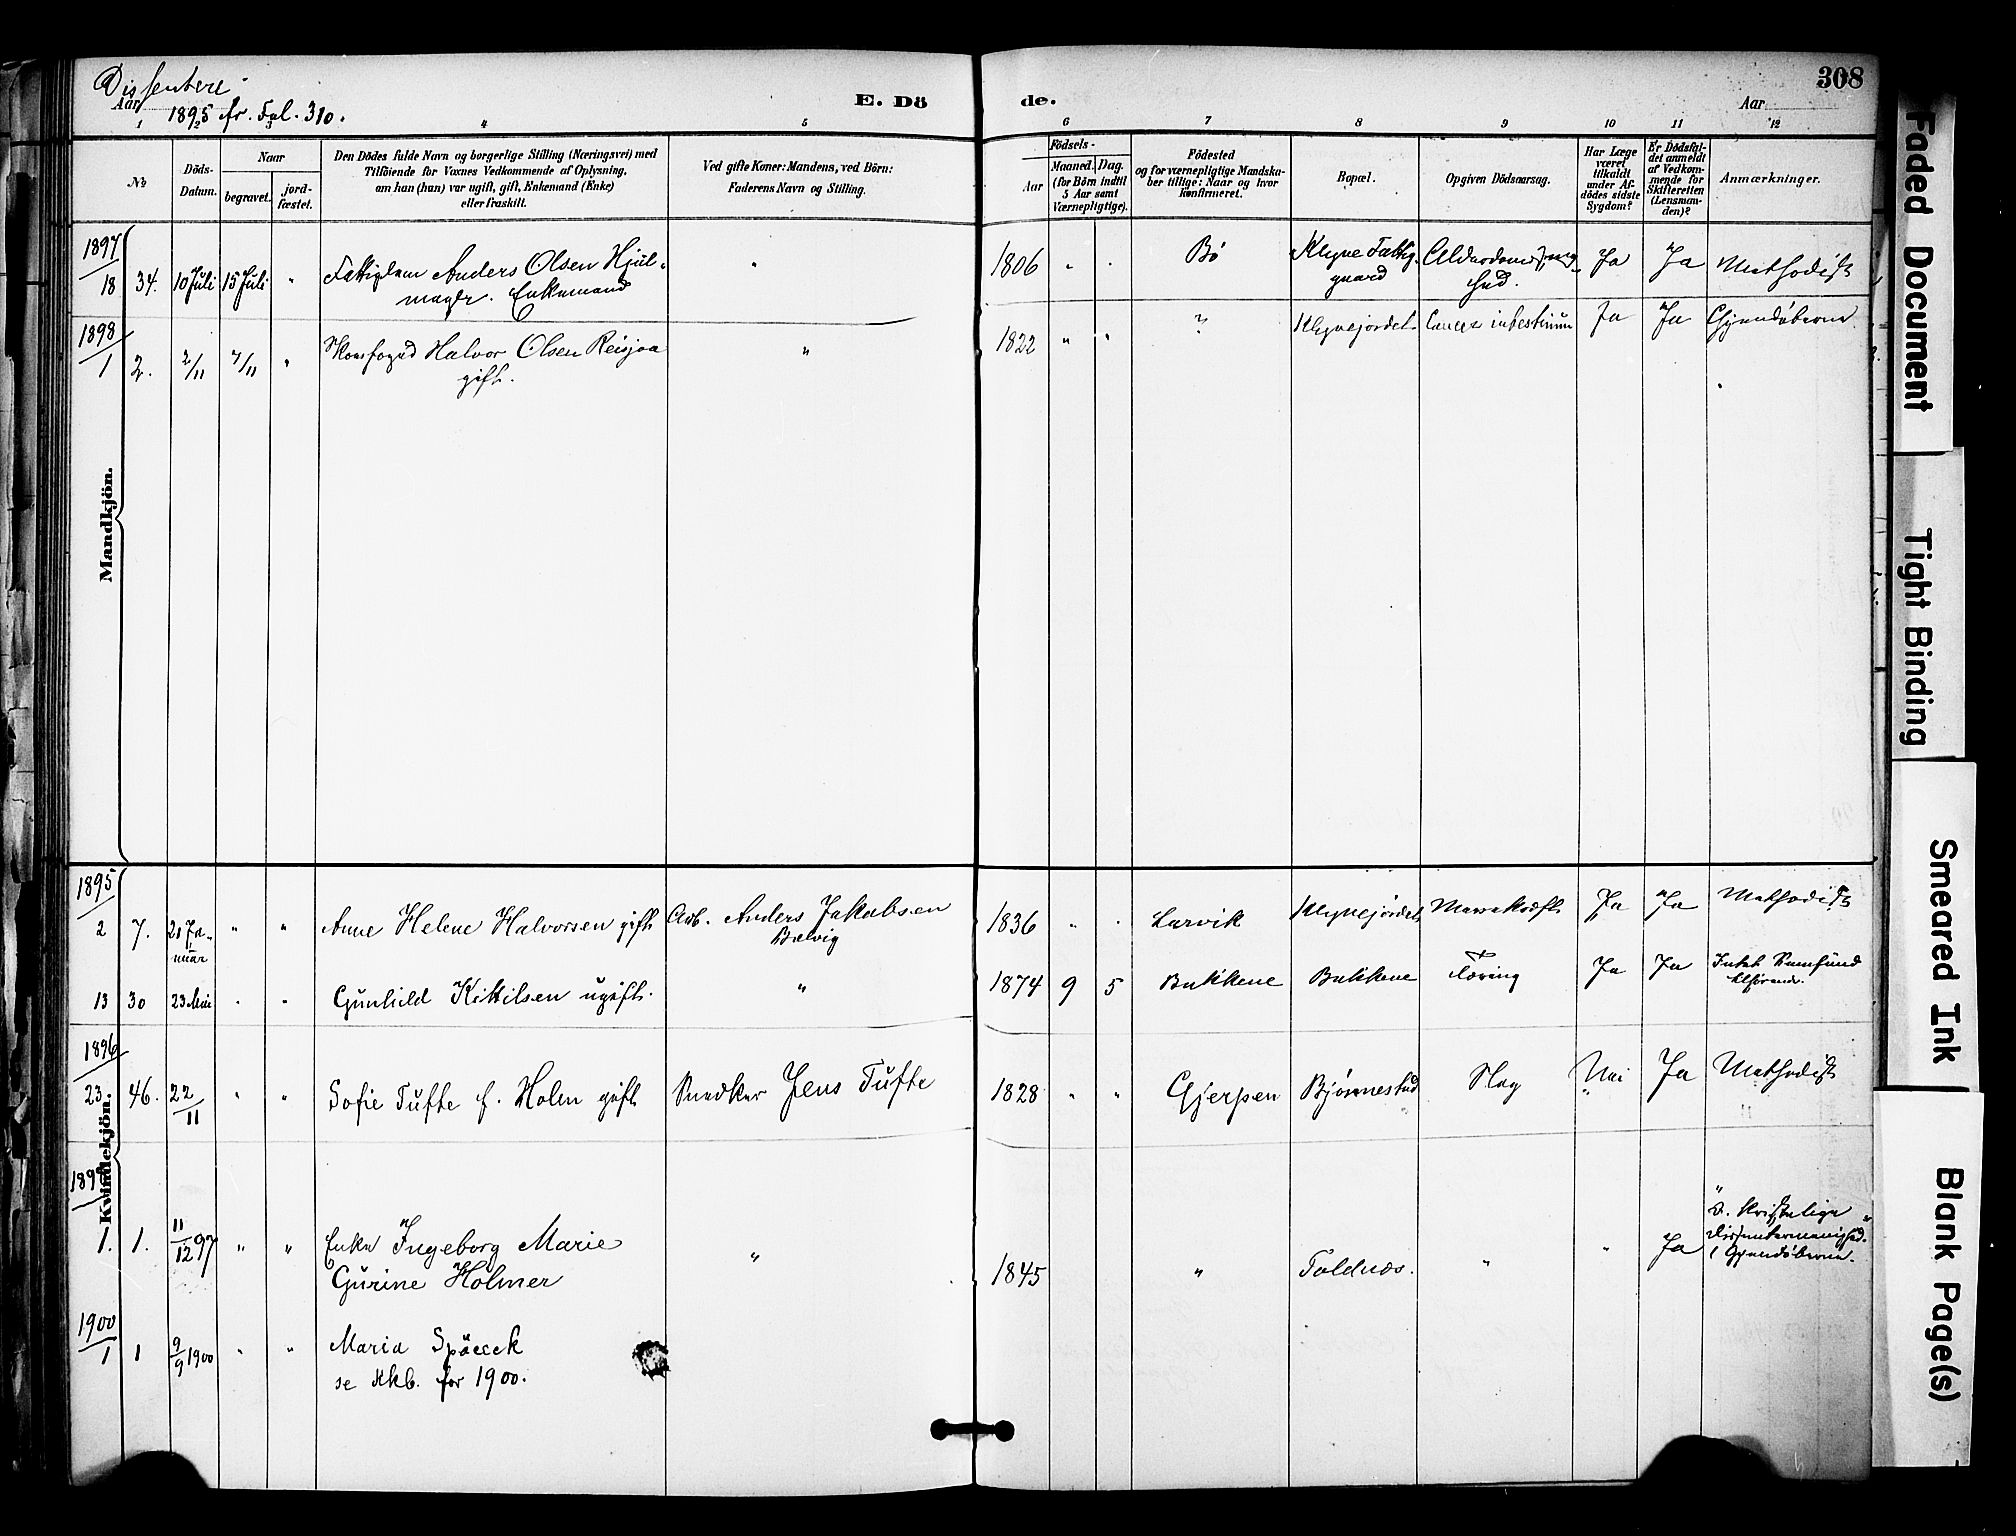 SAKO, Solum kirkebøker, F/Fa/L0010: Ministerialbok nr. I 10, 1888-1898, s. 308